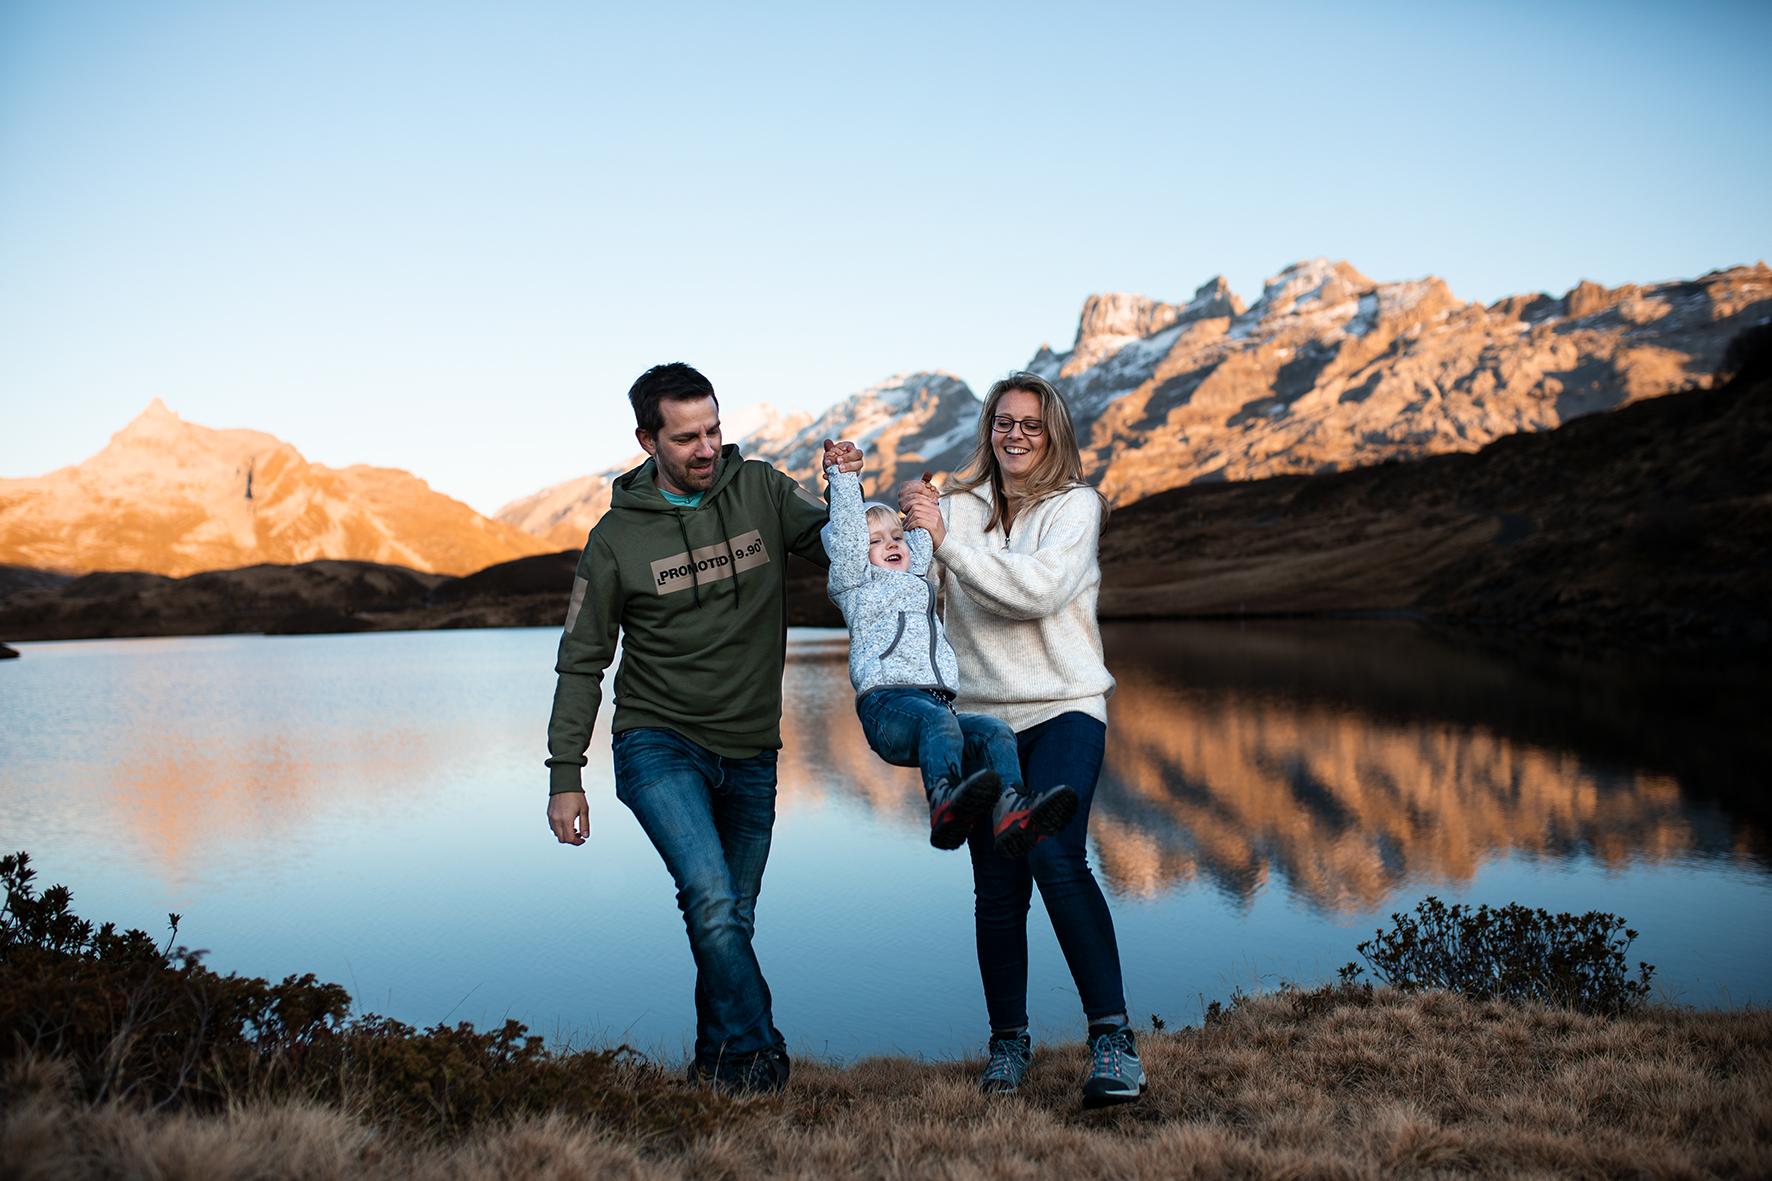 Familienshooting_Familienfotografie_Luzern_Schweiz_24